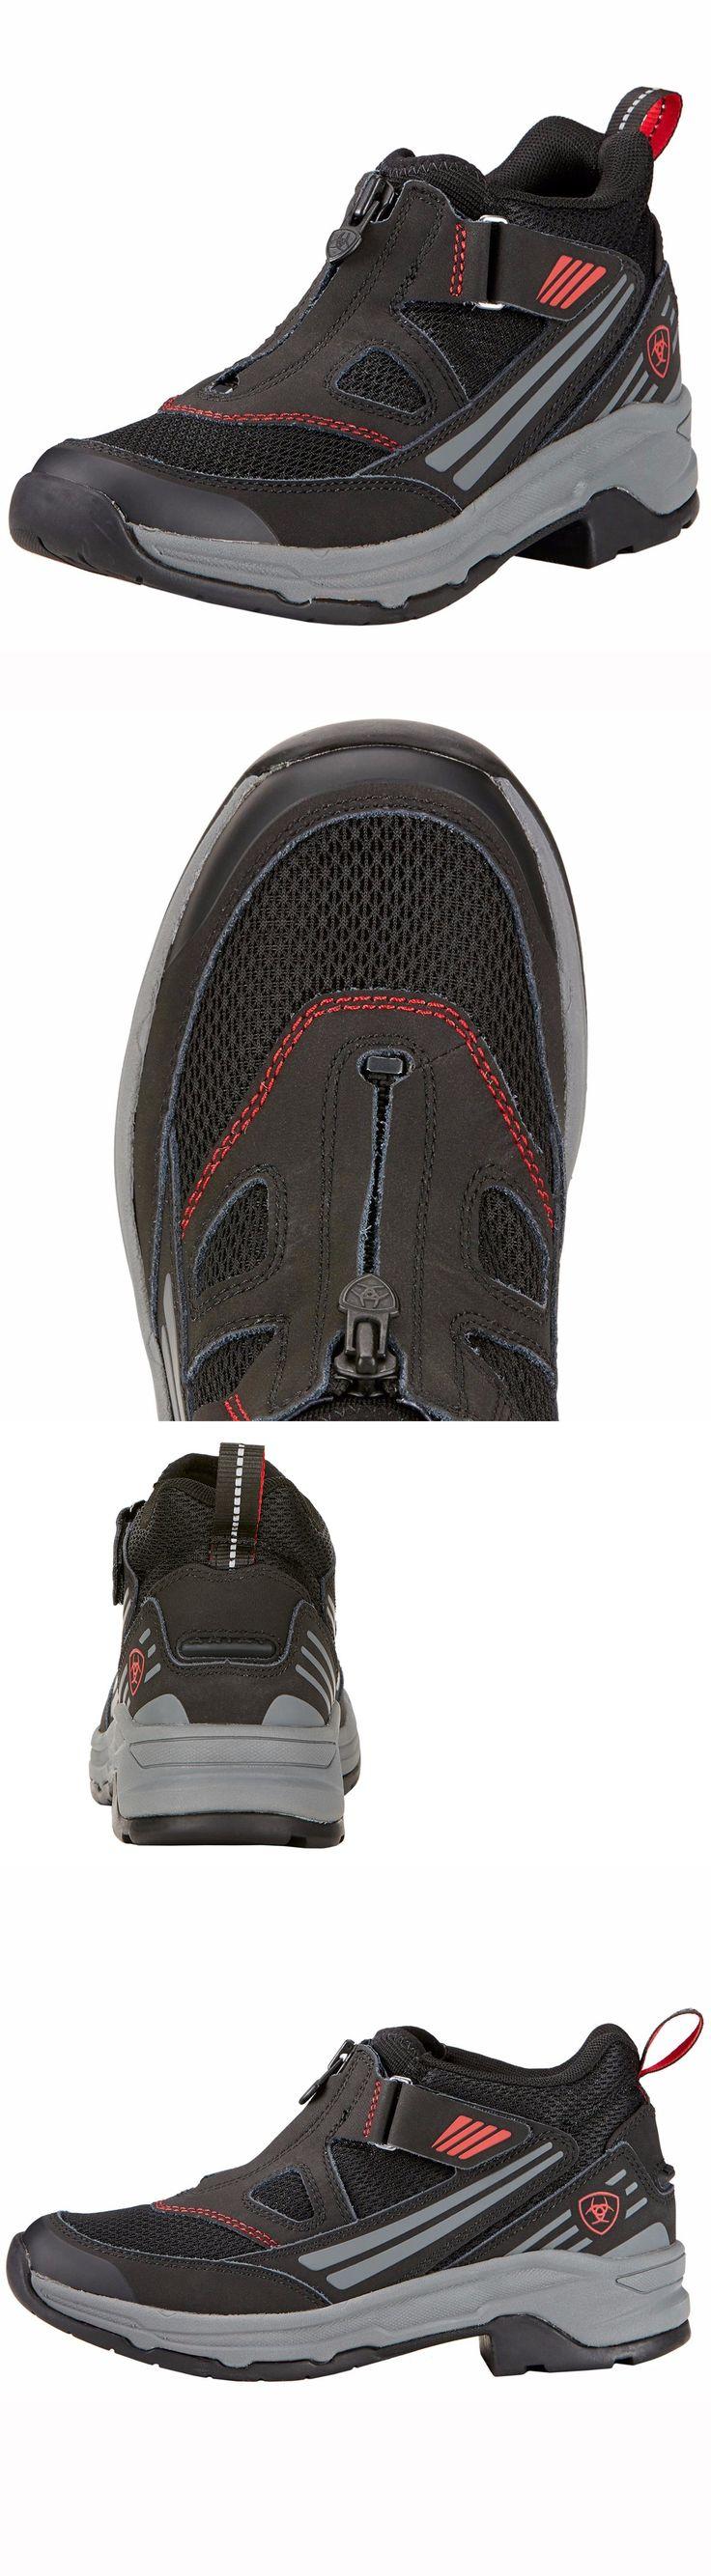 Paddock and Jodhpur Boots 100253: New Sz 7 Ariat Maxtrak Ul Zip Womens Riding Boot Endurance Trail Terrain Shoe BUY IT NOW ONLY: $92.95